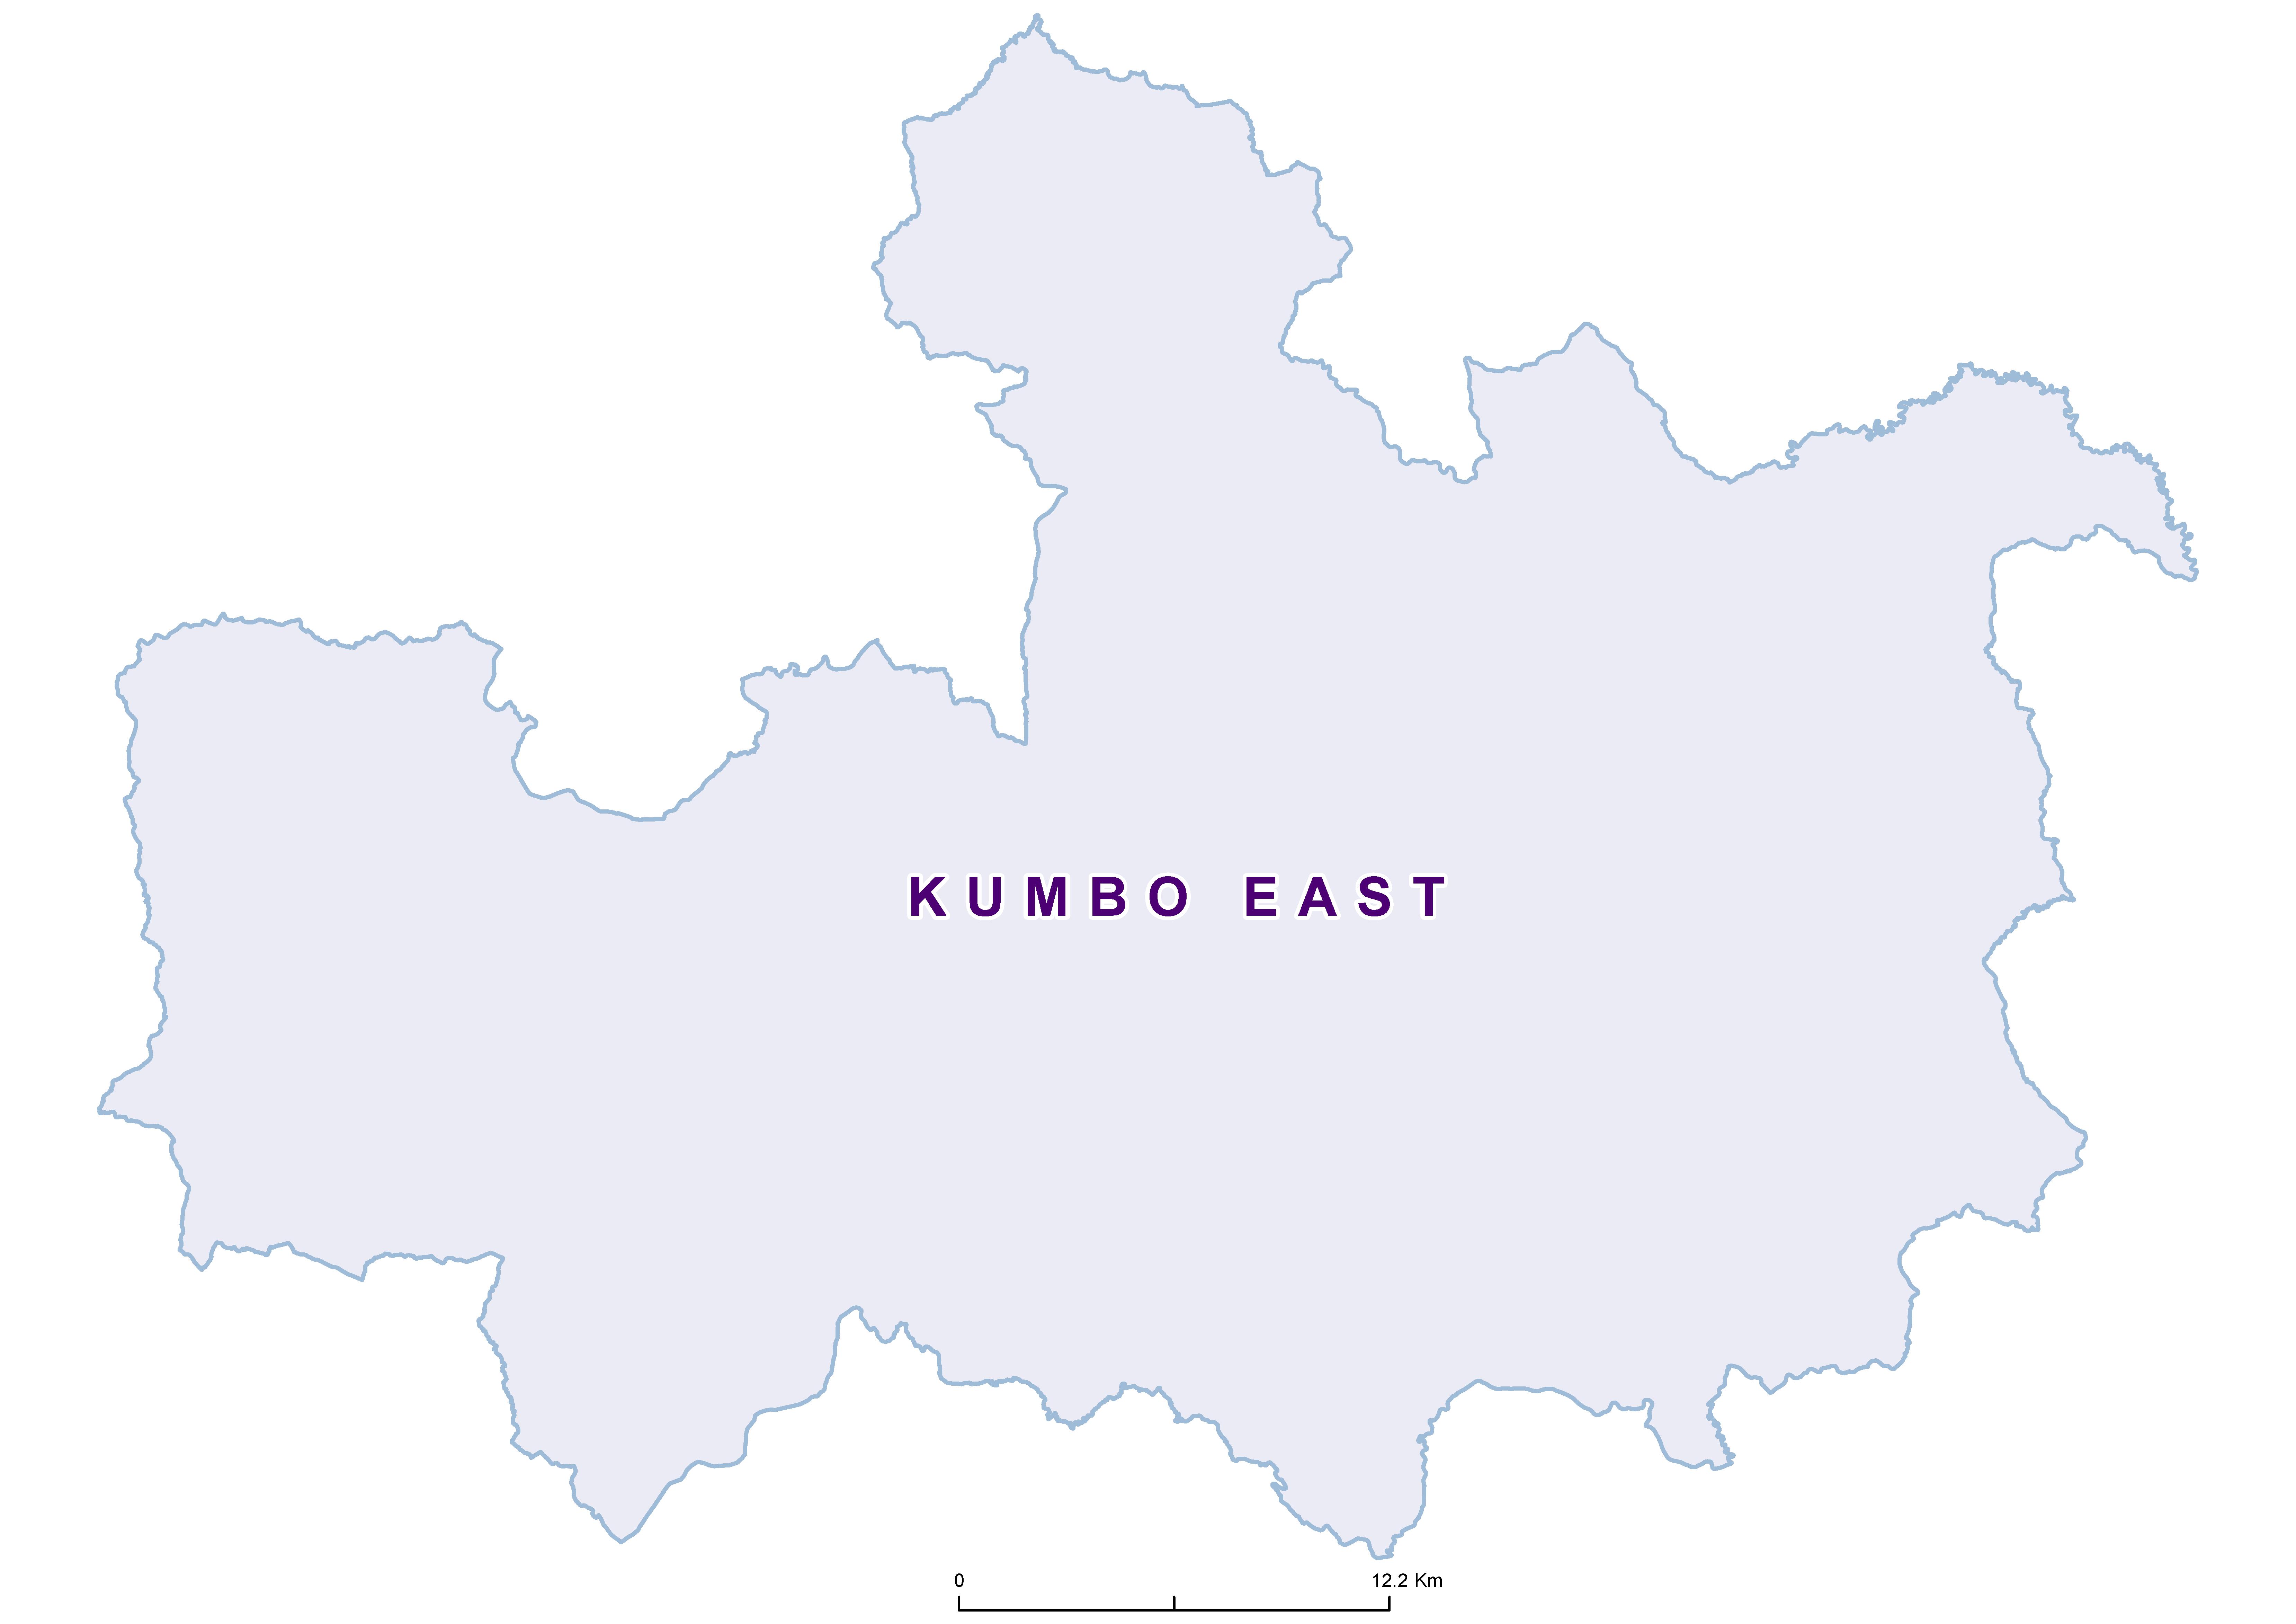 Kumbo east Mean SCH 19850001